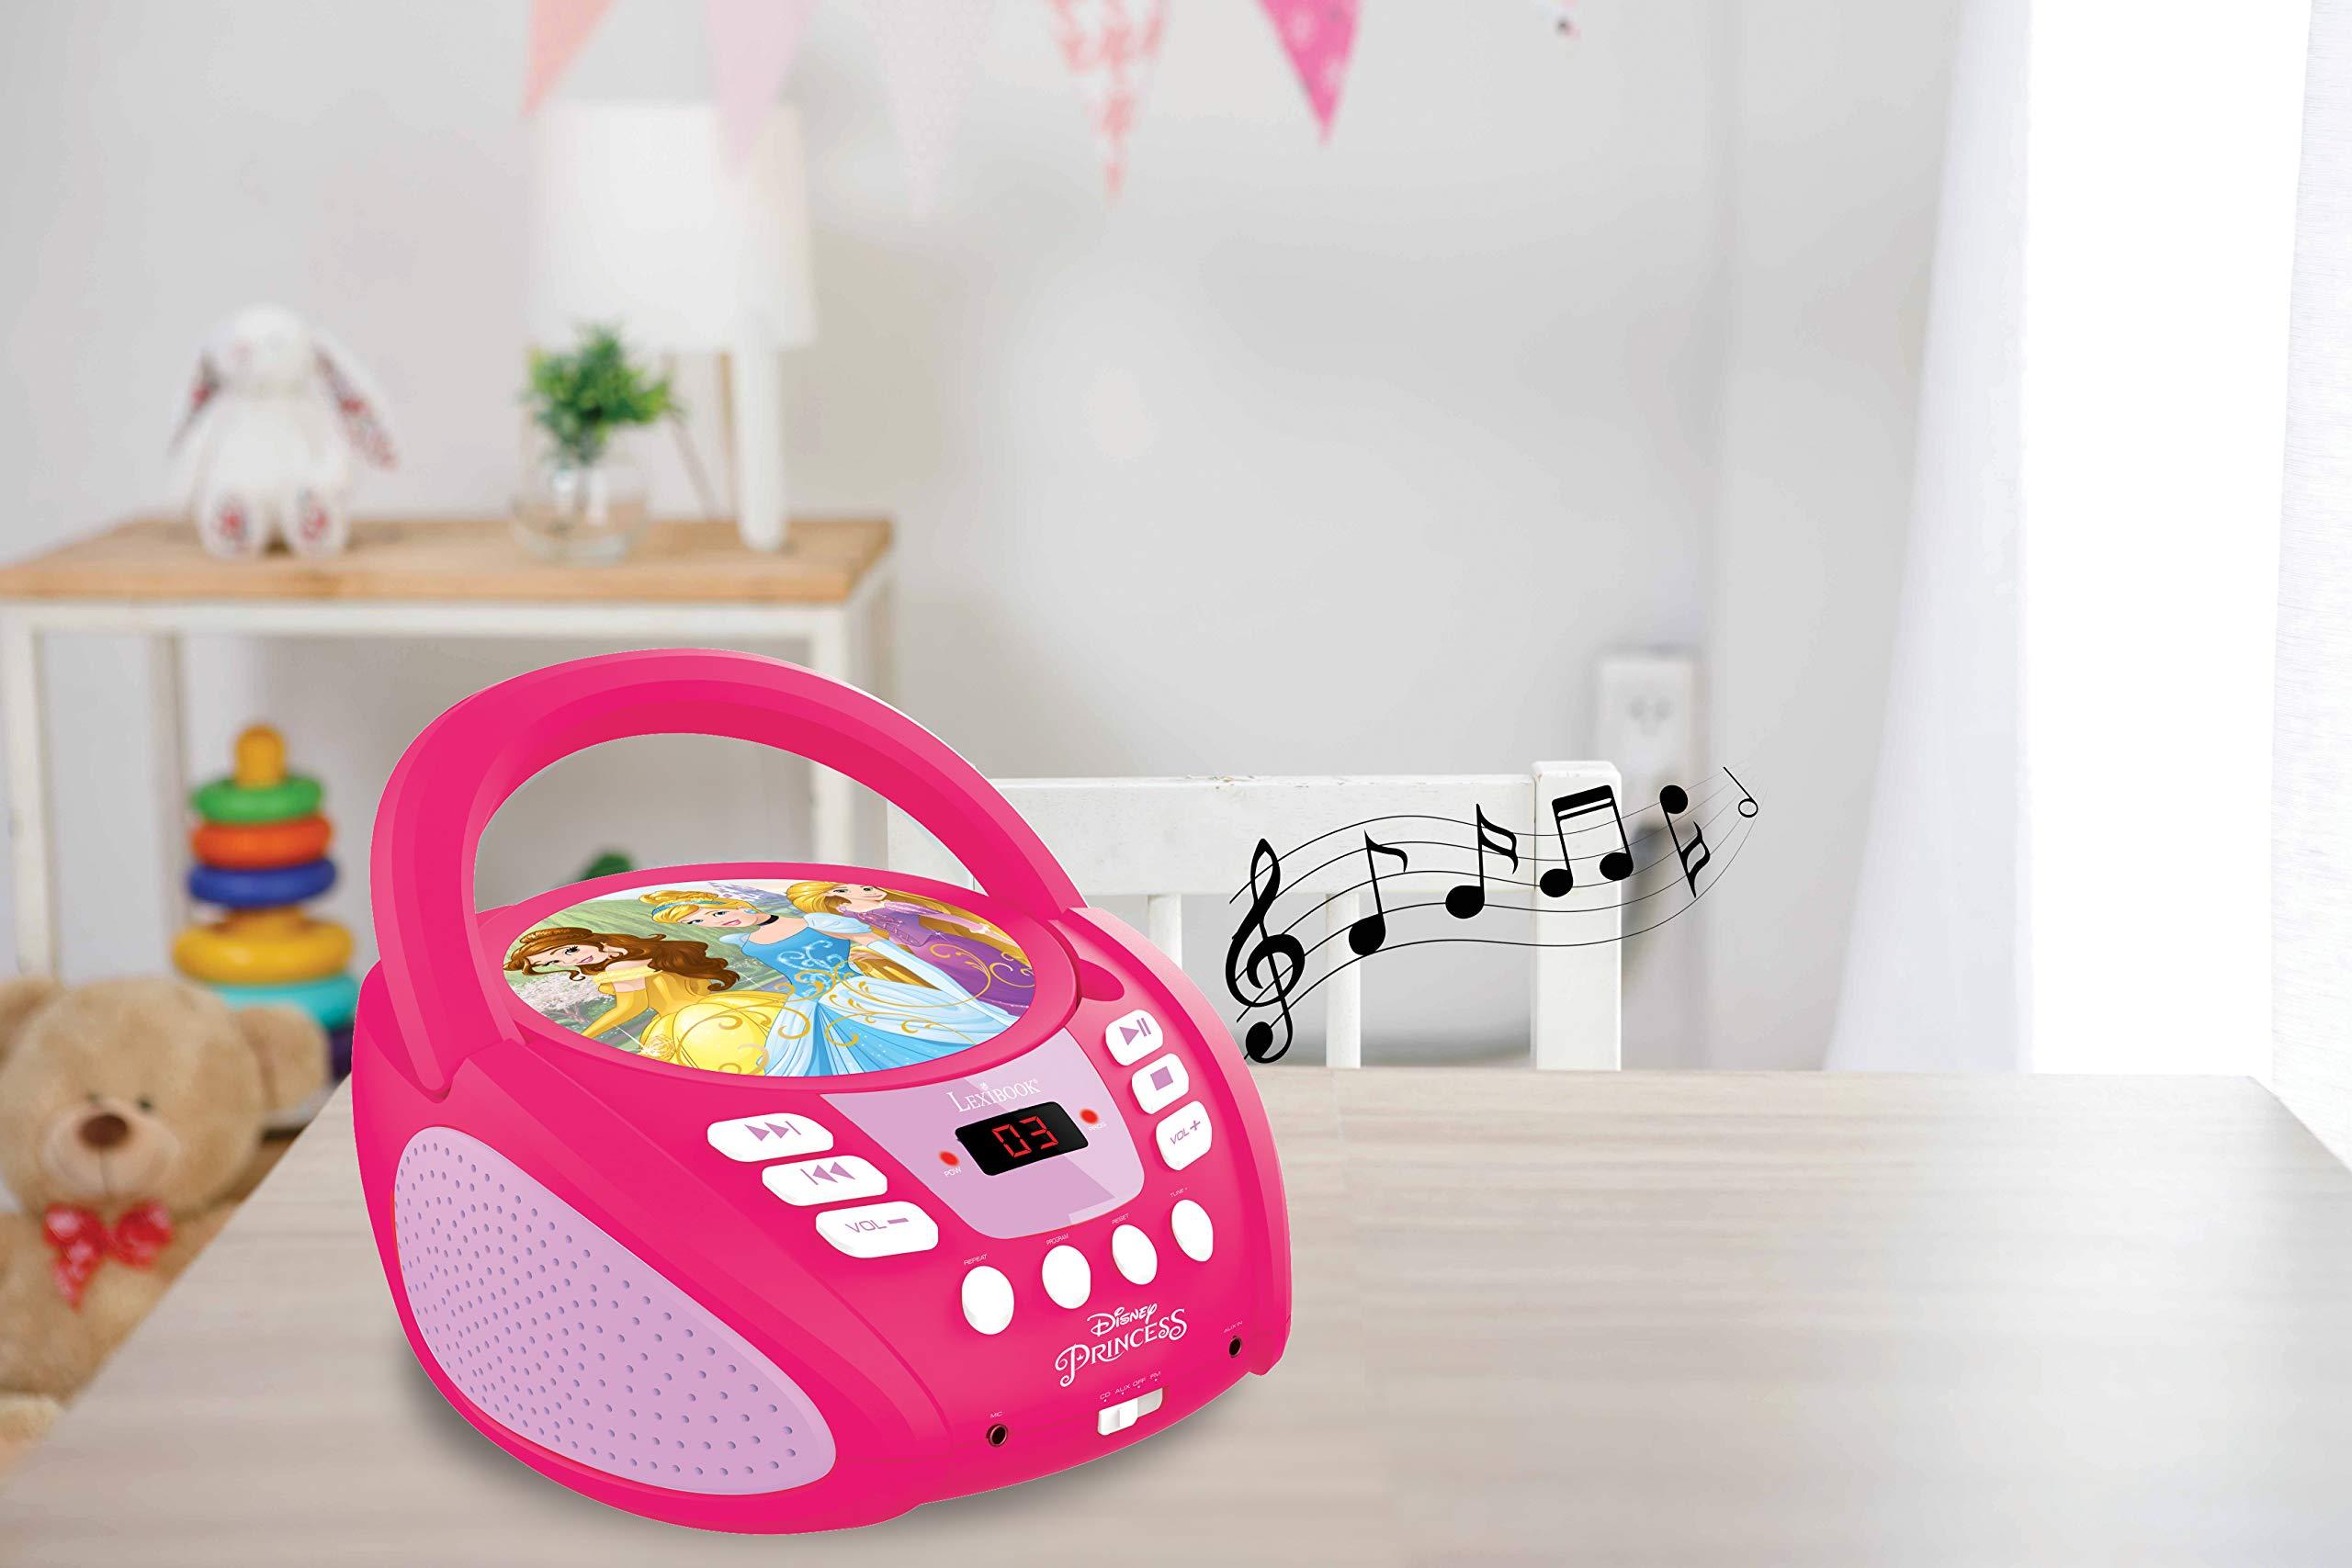 LEXiBOOK Disney Princess Boombox Radio CD Player by LEXiBOOK (Image #5)